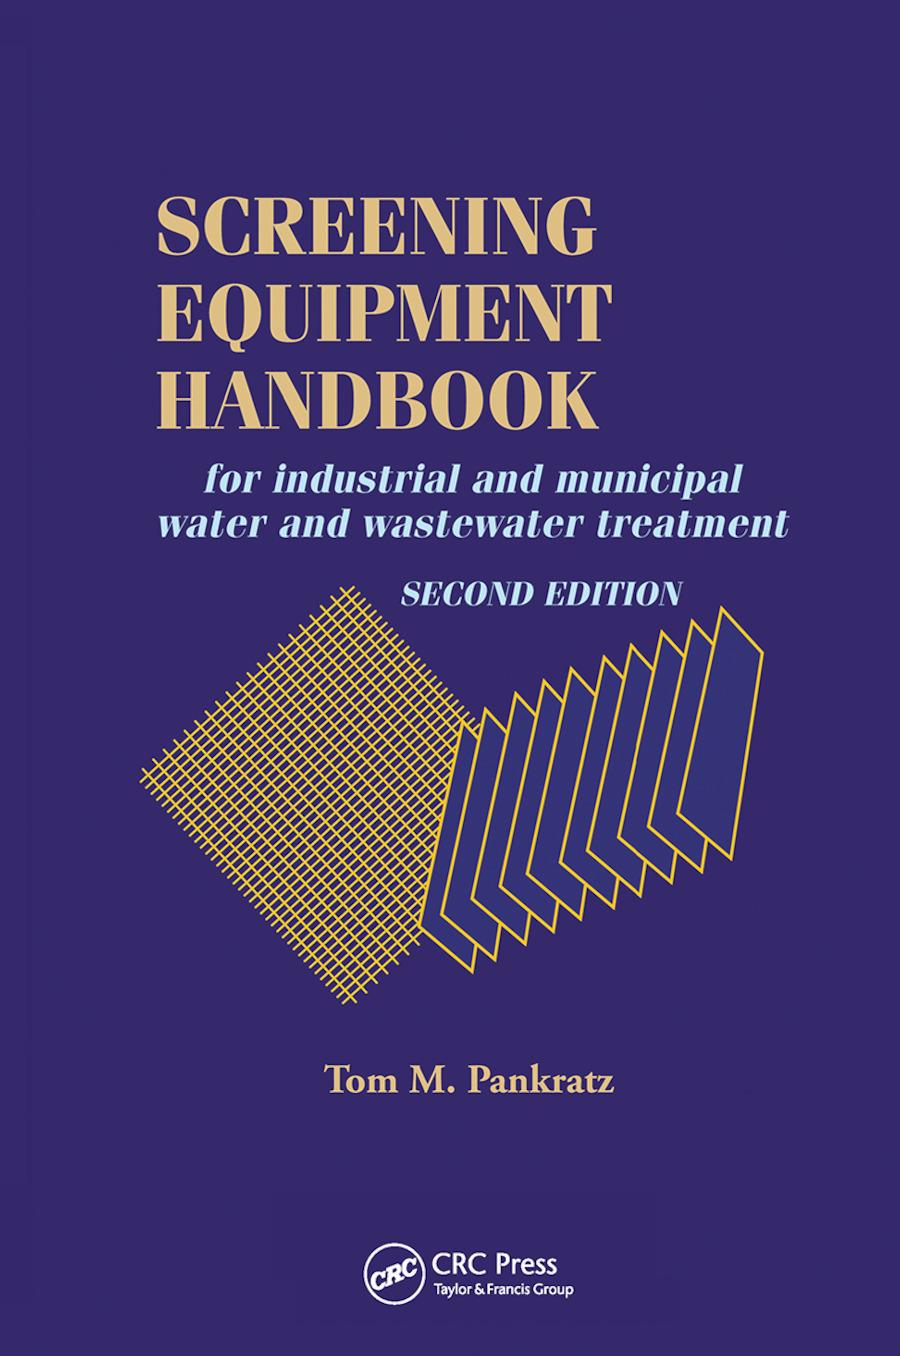 Screening Equipment Handbook